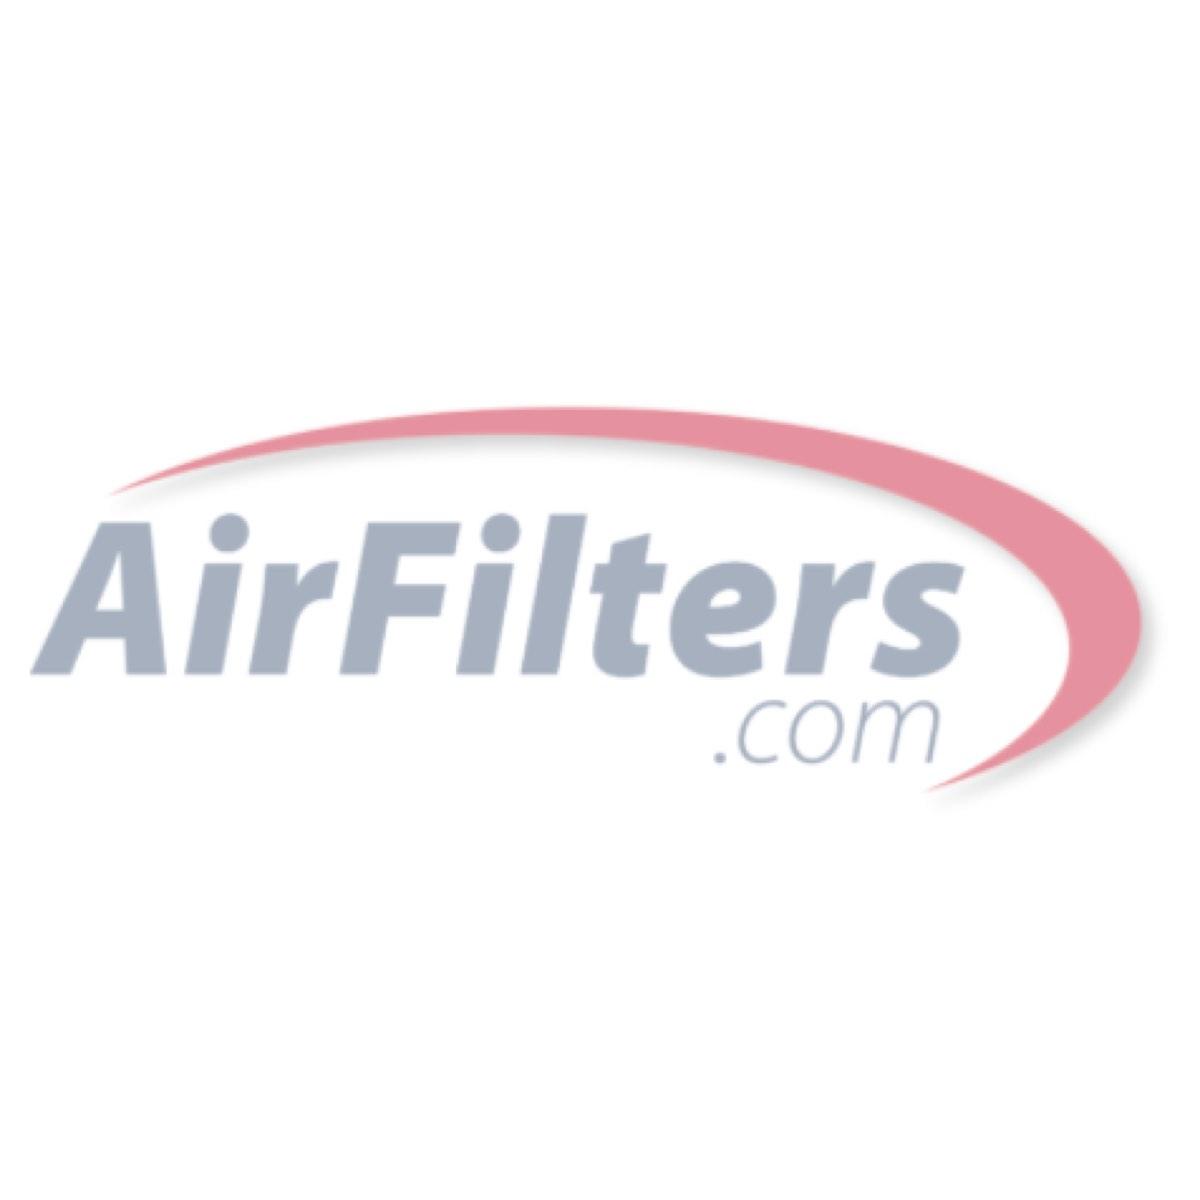 20x20x1 Carrier Air Purifier Carbon Filters